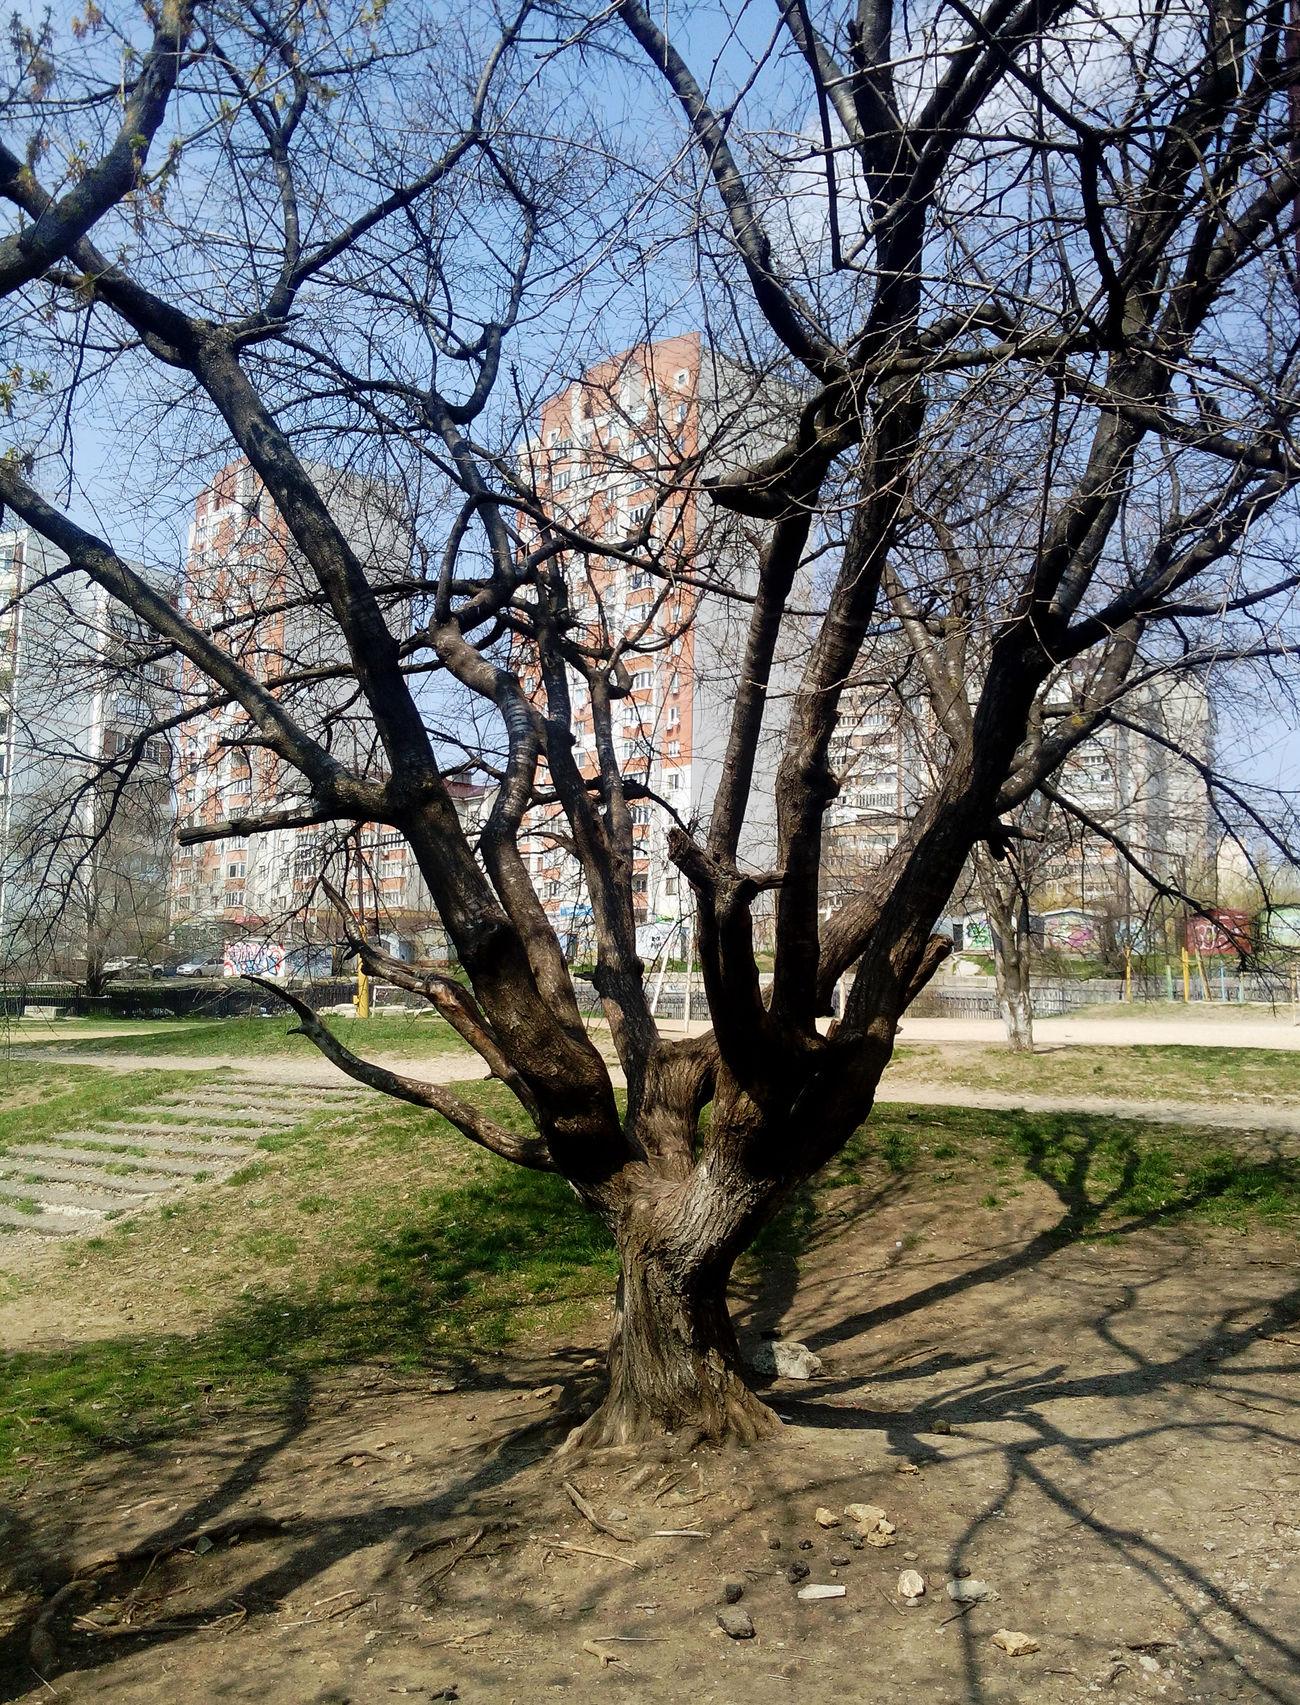 Beautiful Nature Beauty Cortex Curl зеленый Green Коричневый Grass Green Color Tree No People Outdoors Day Flora древесная кора дерево ствол растительность Природа Life Architecture Rostov-on-Don